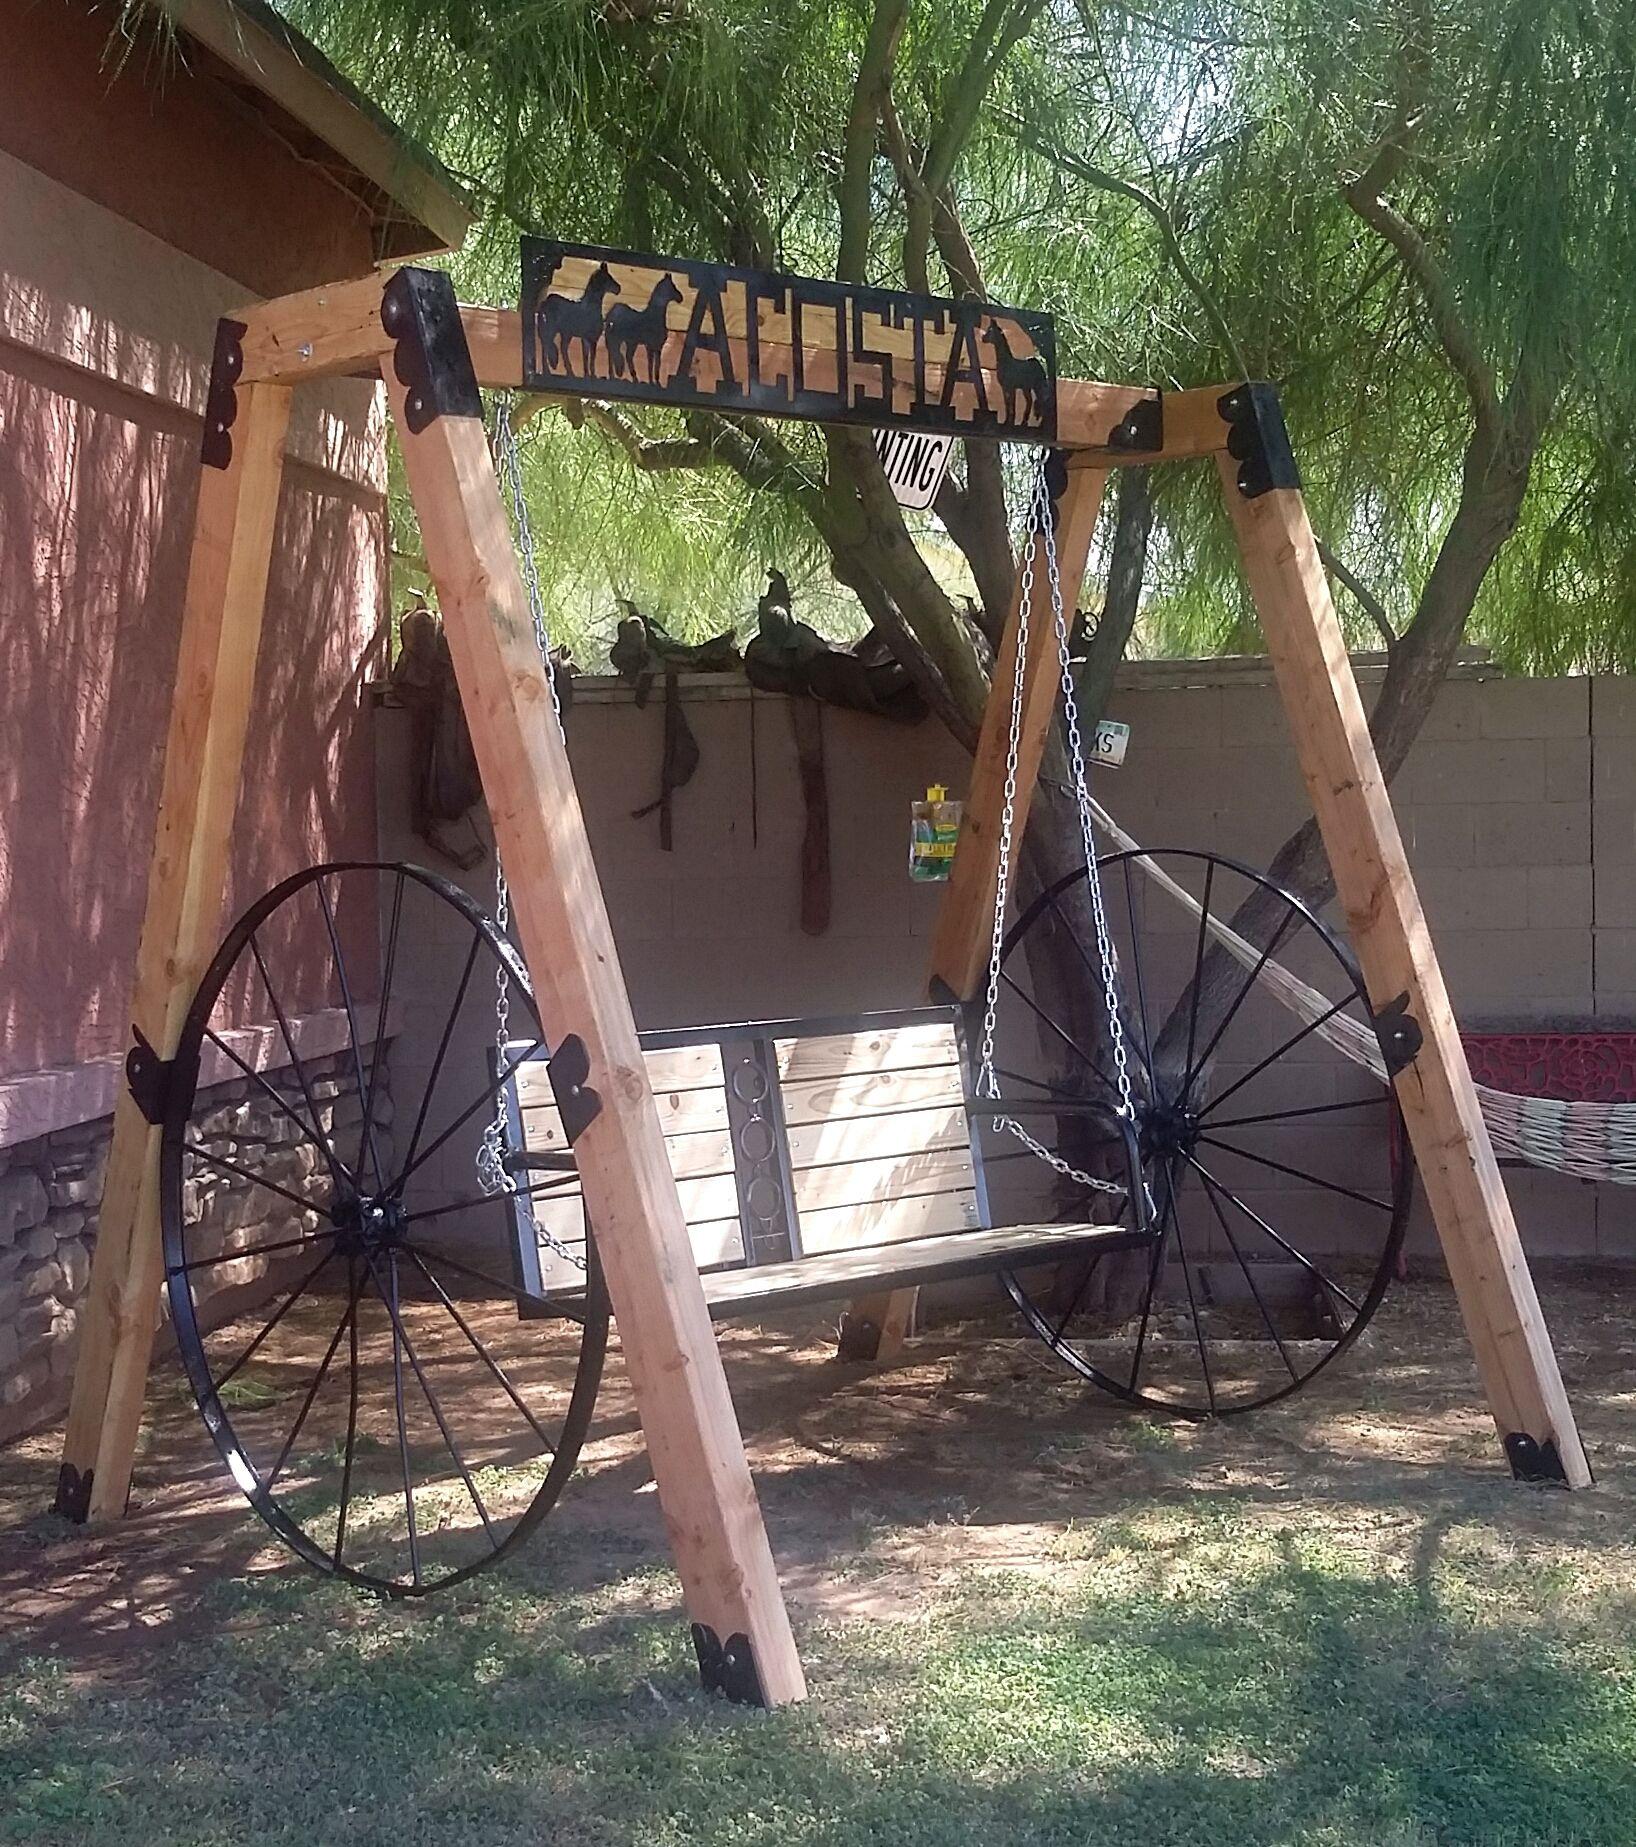 Wooded Metal Wagon Wheels Swing Set With Beer Holder